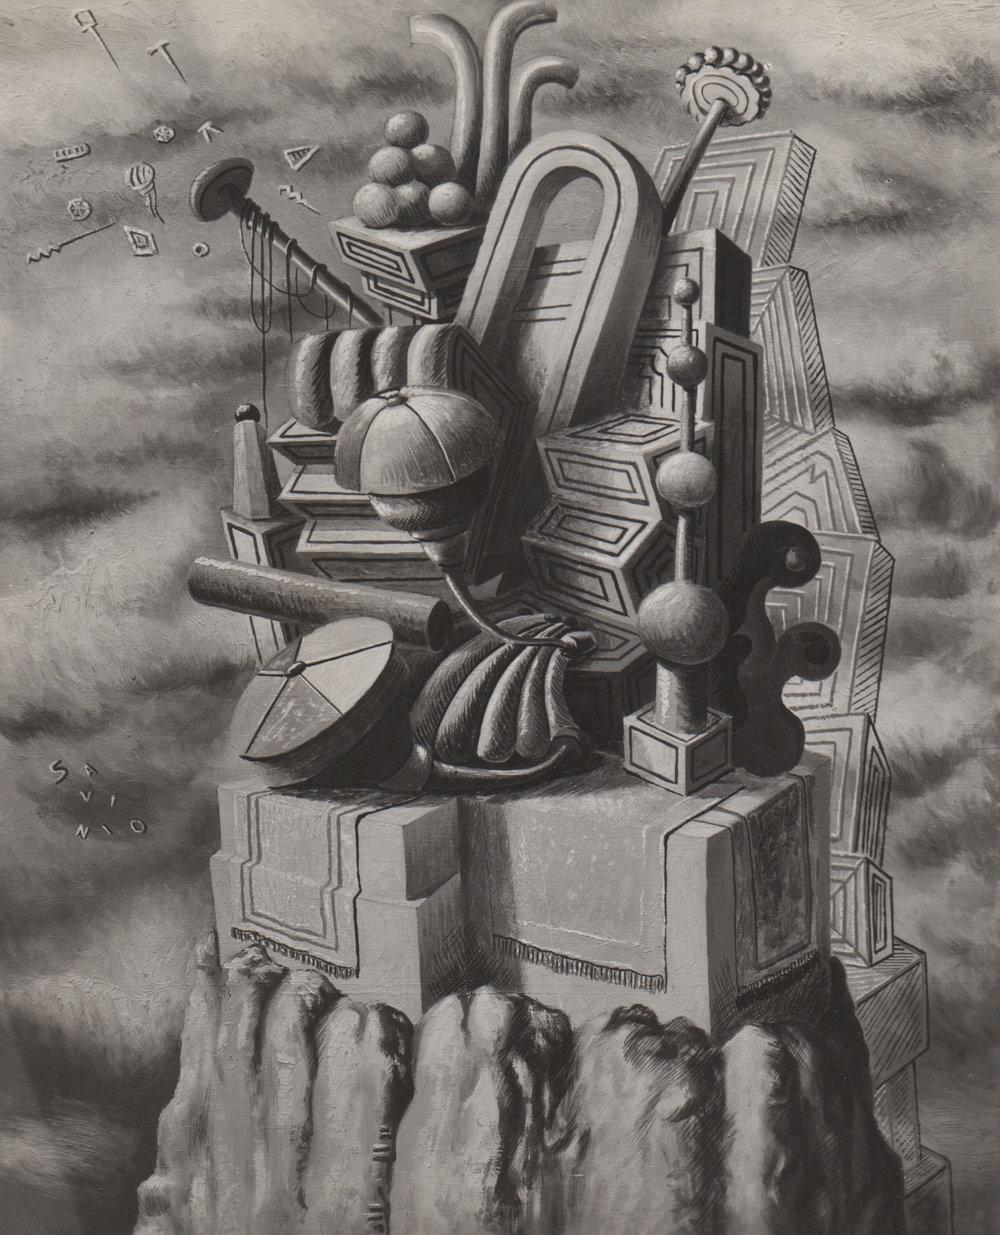 1930, 1, p.92, Monumento ai giocattoli.jpg